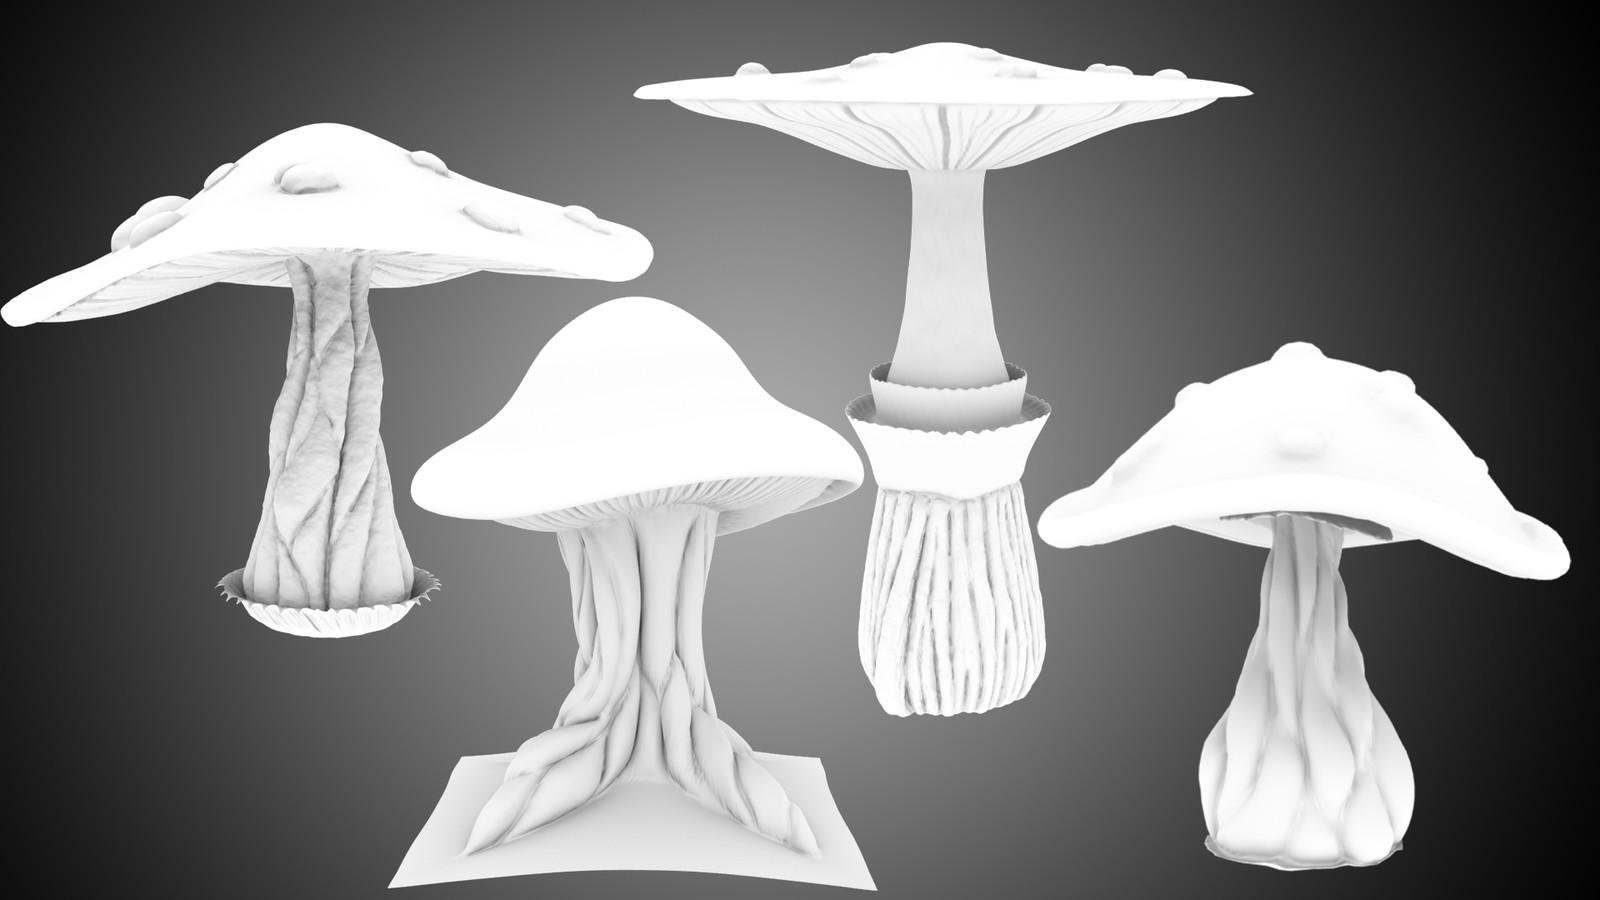 Mushroom models OC with Brush